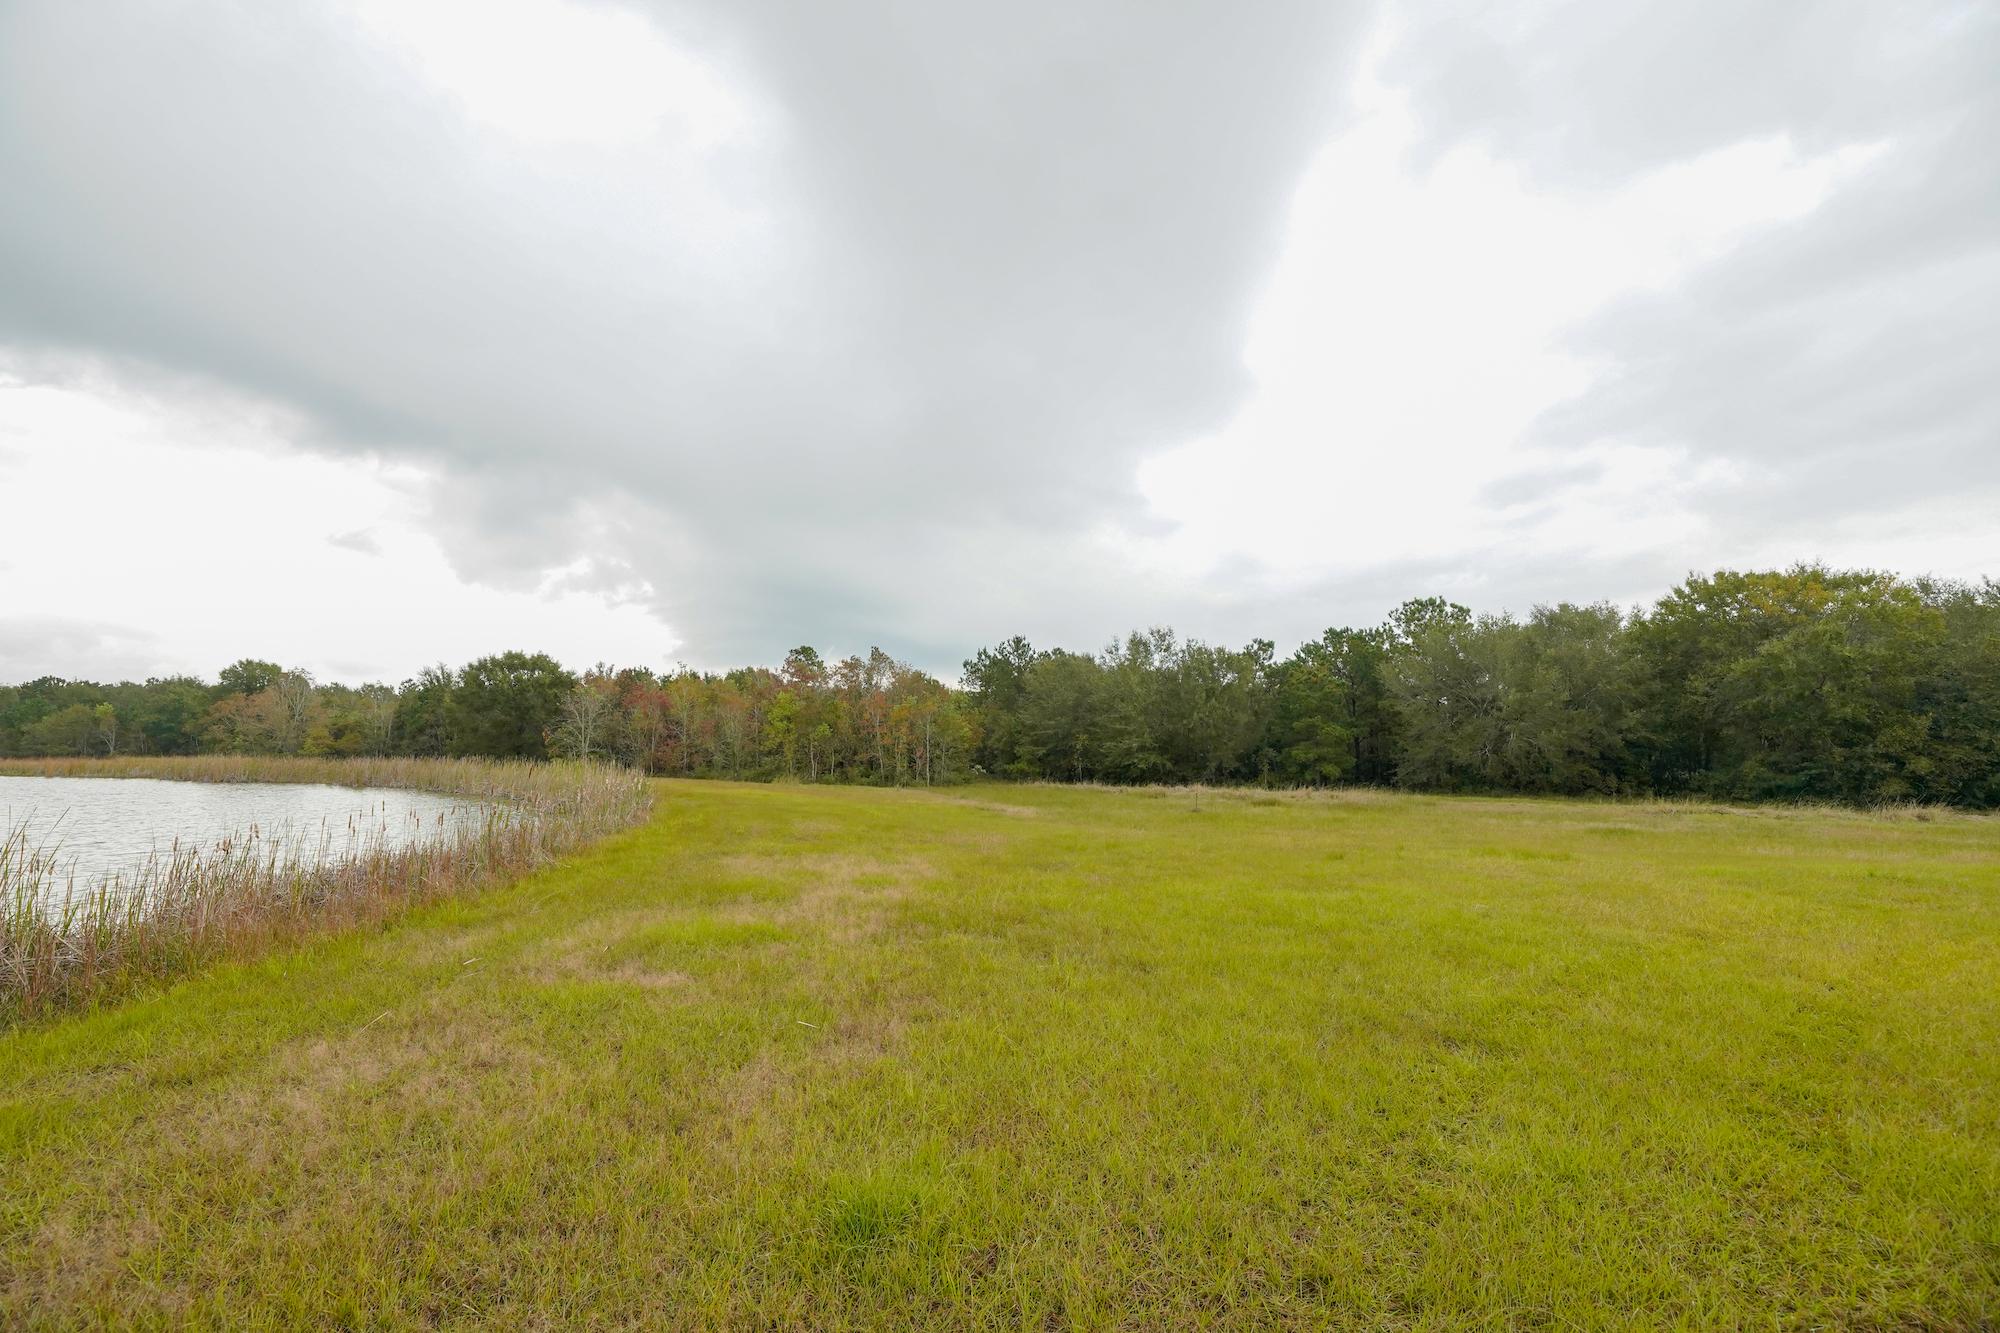 Jefferson County Development Land - Image 20 of 36